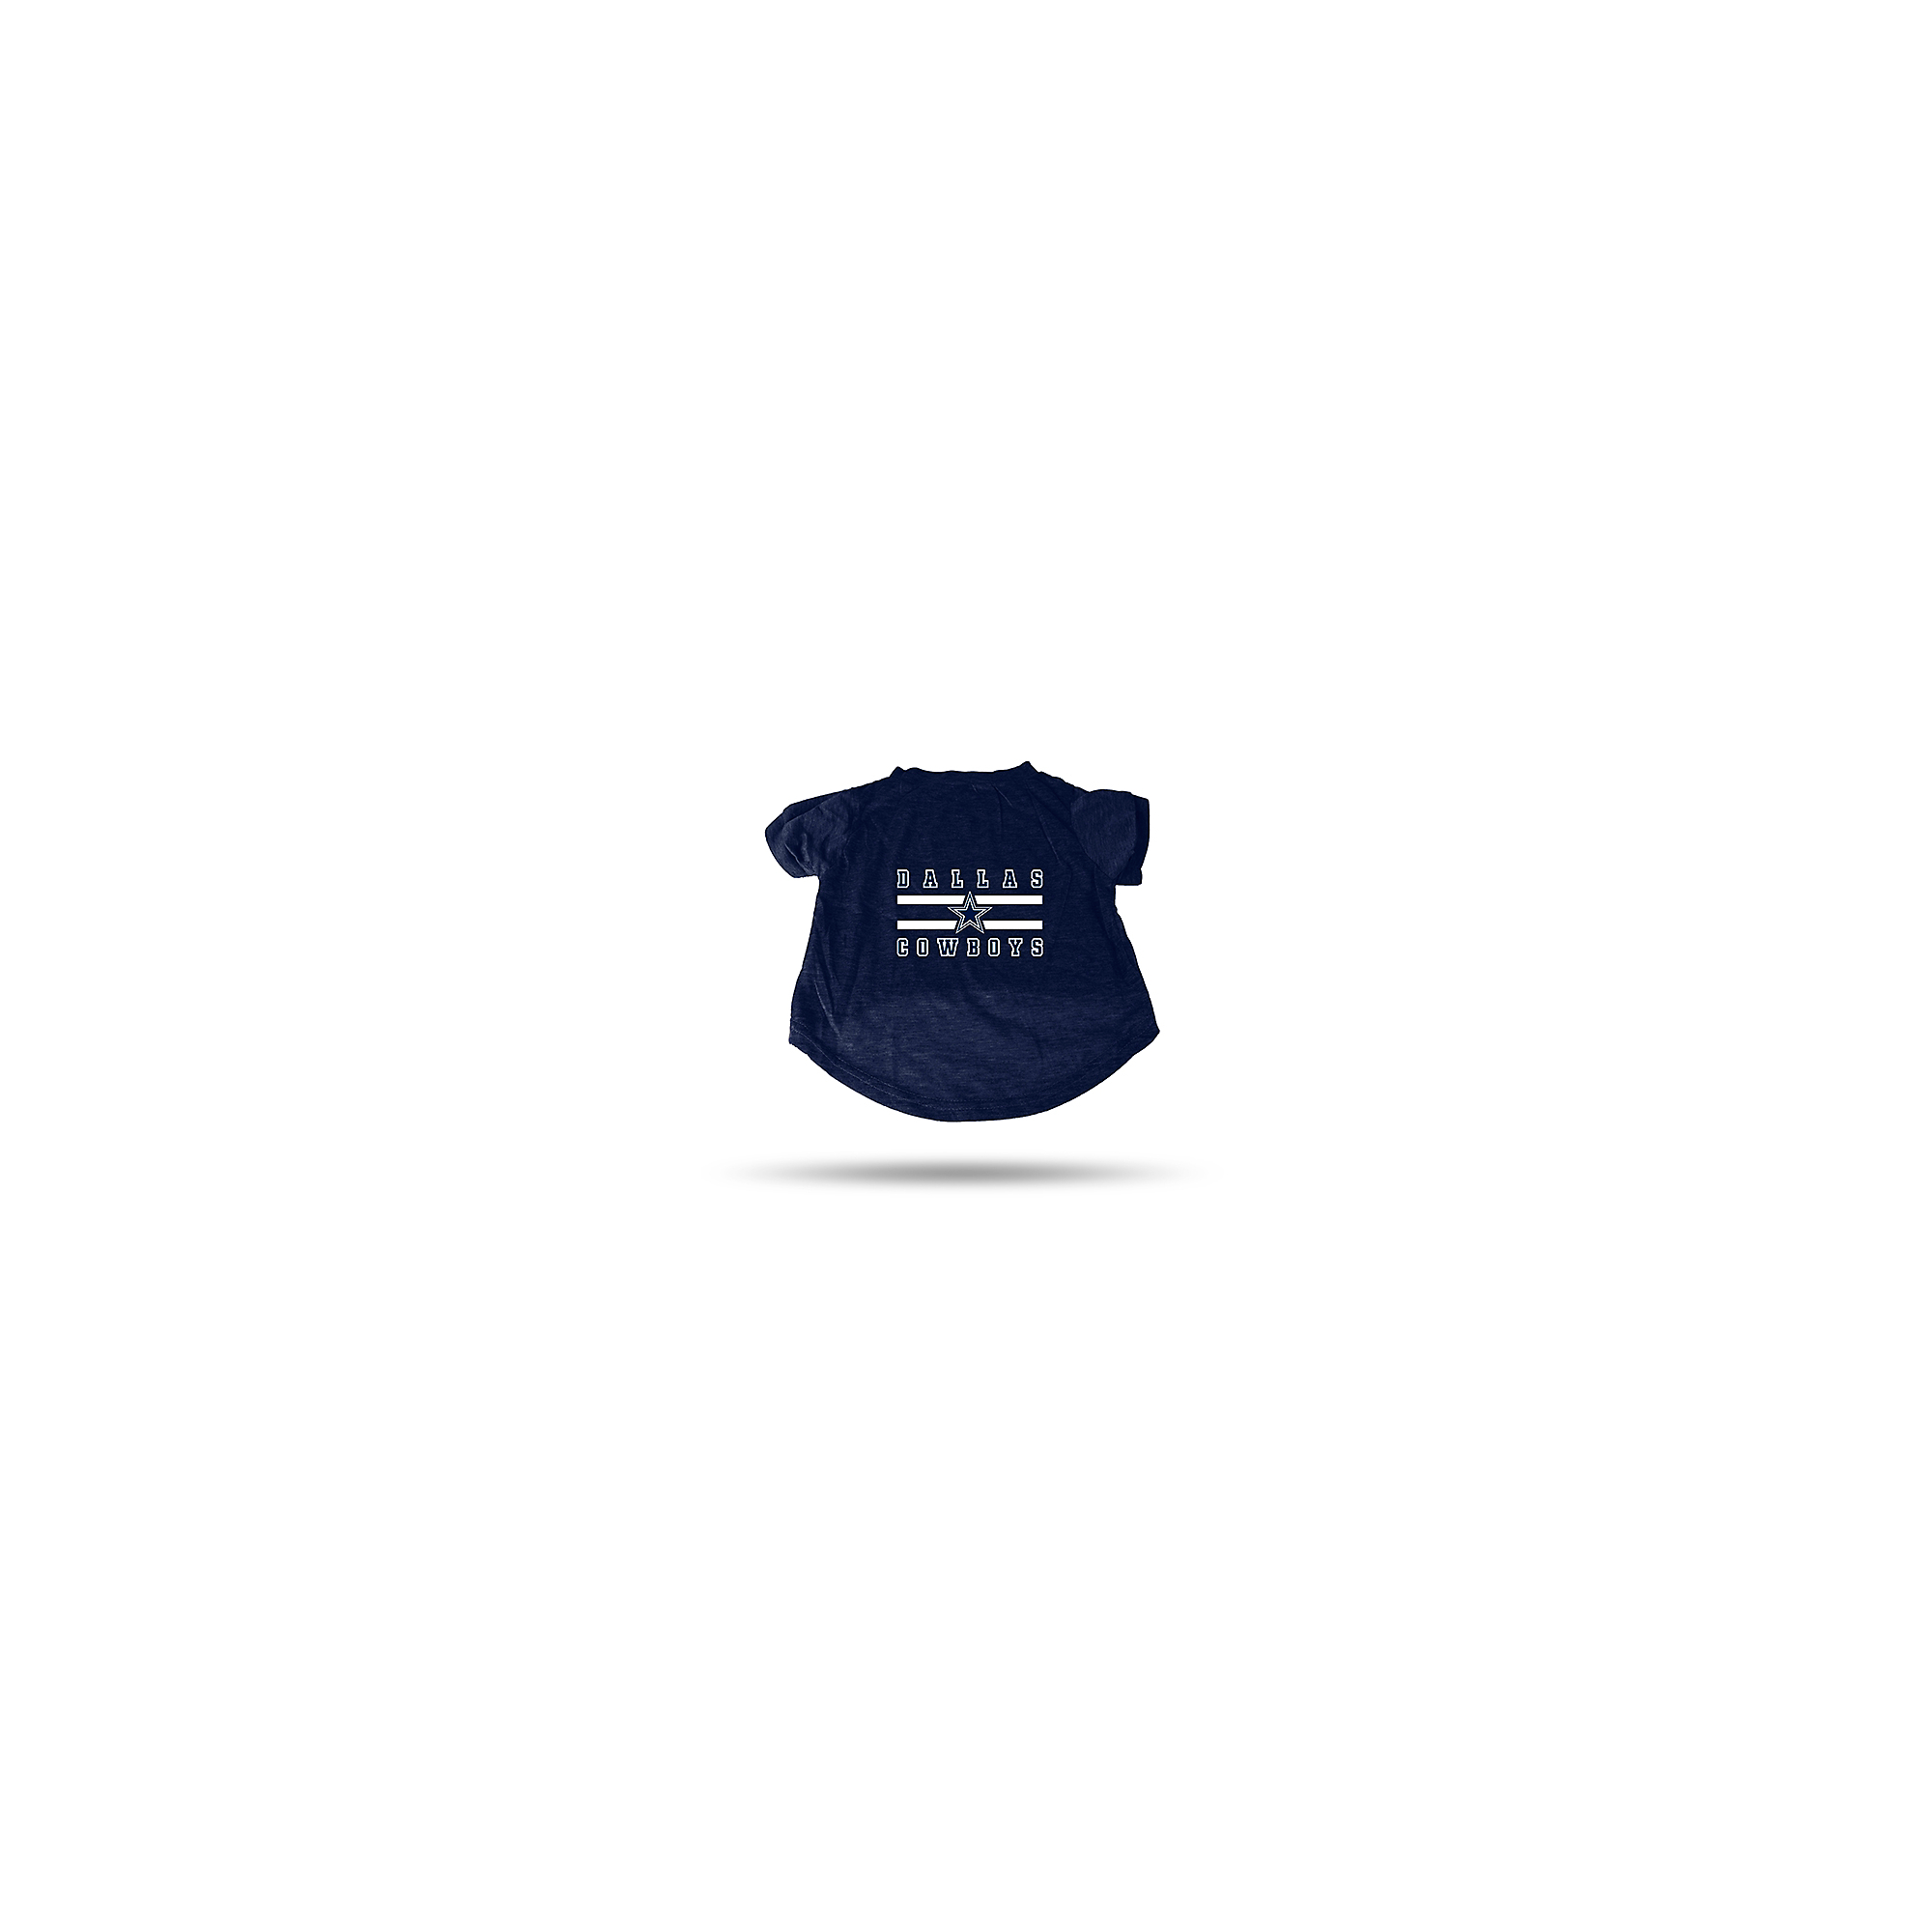 Dallas Cowboys Pet Shirt - Large